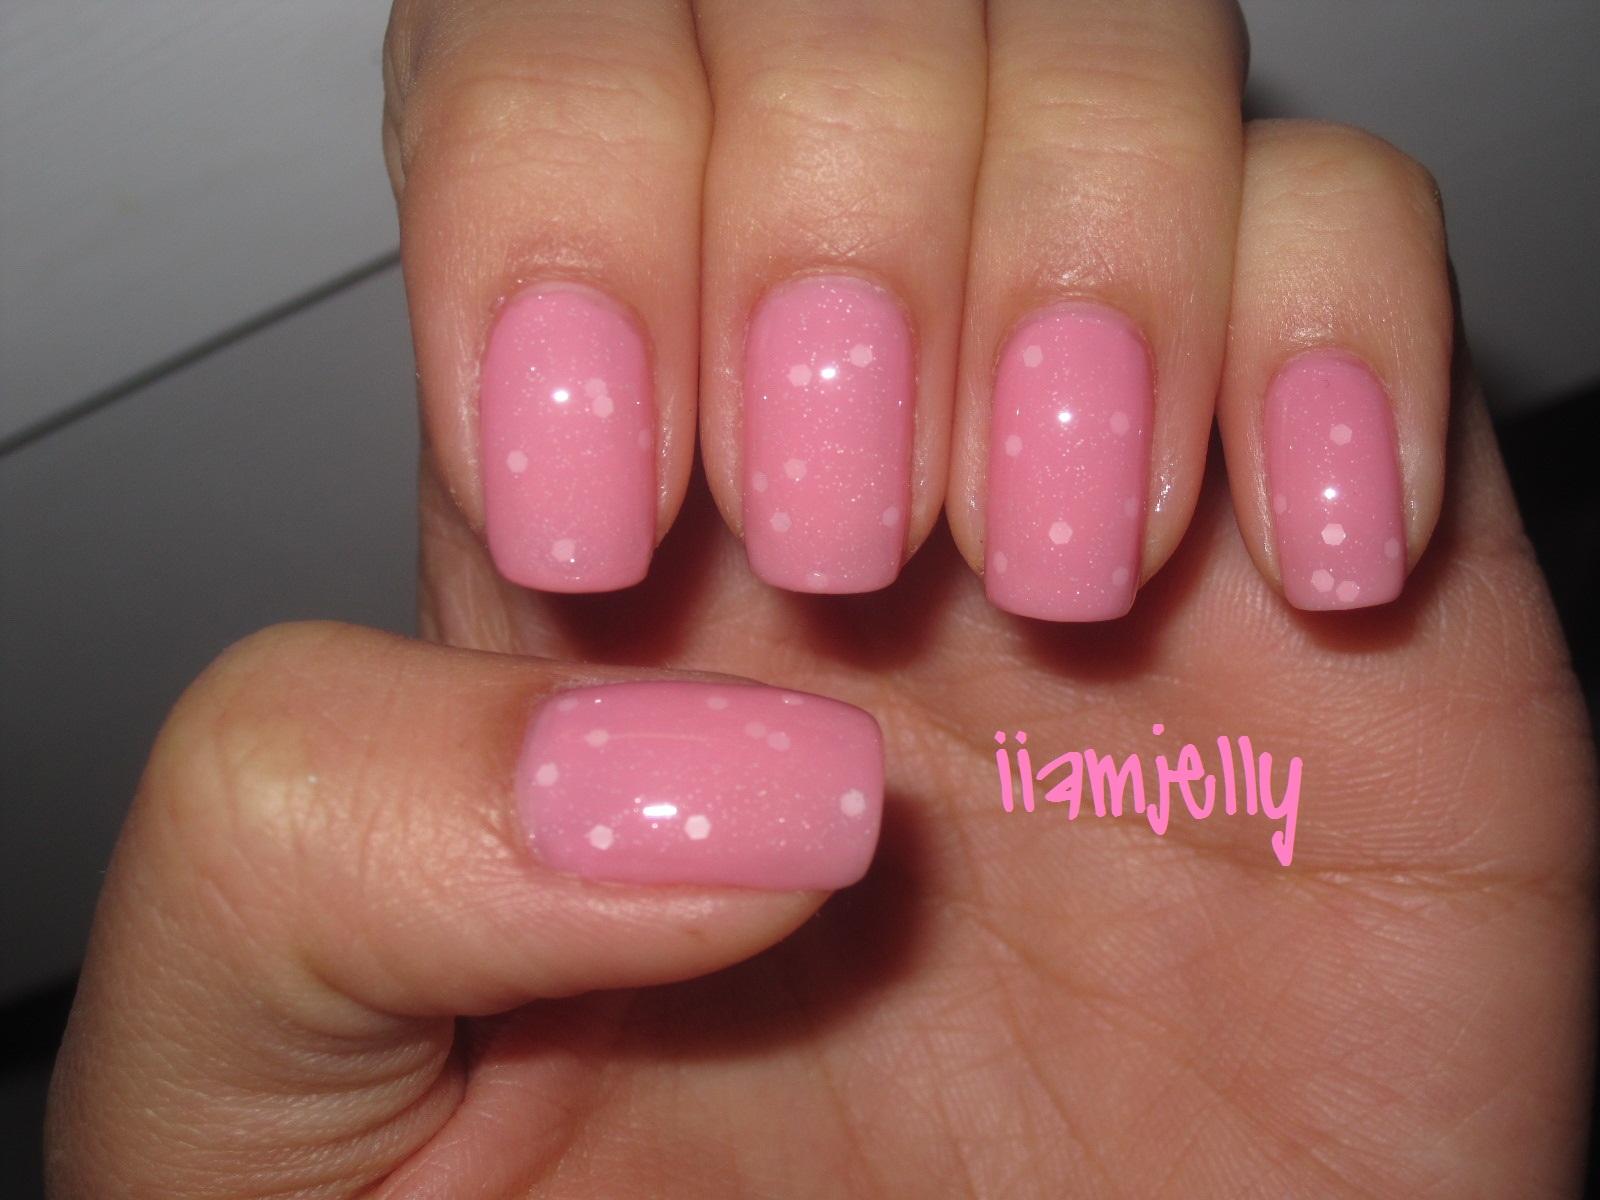 Jelly's Nails